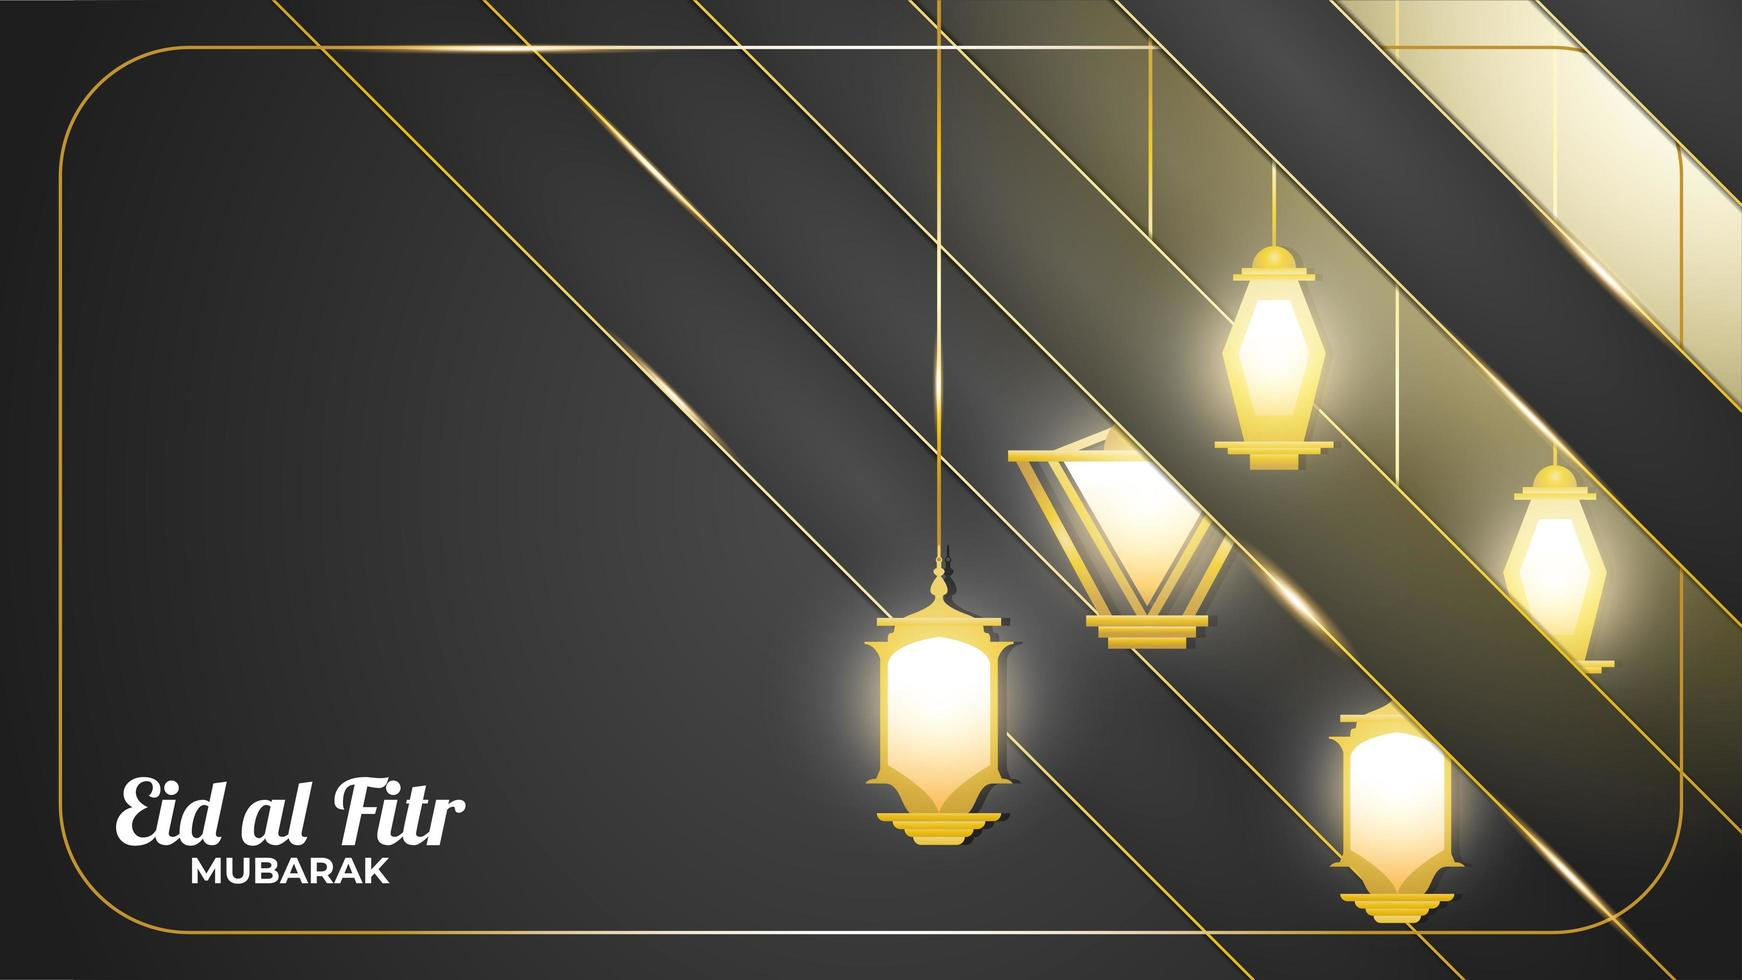 Eid Mubarak Banner with Gold Lanterns vector